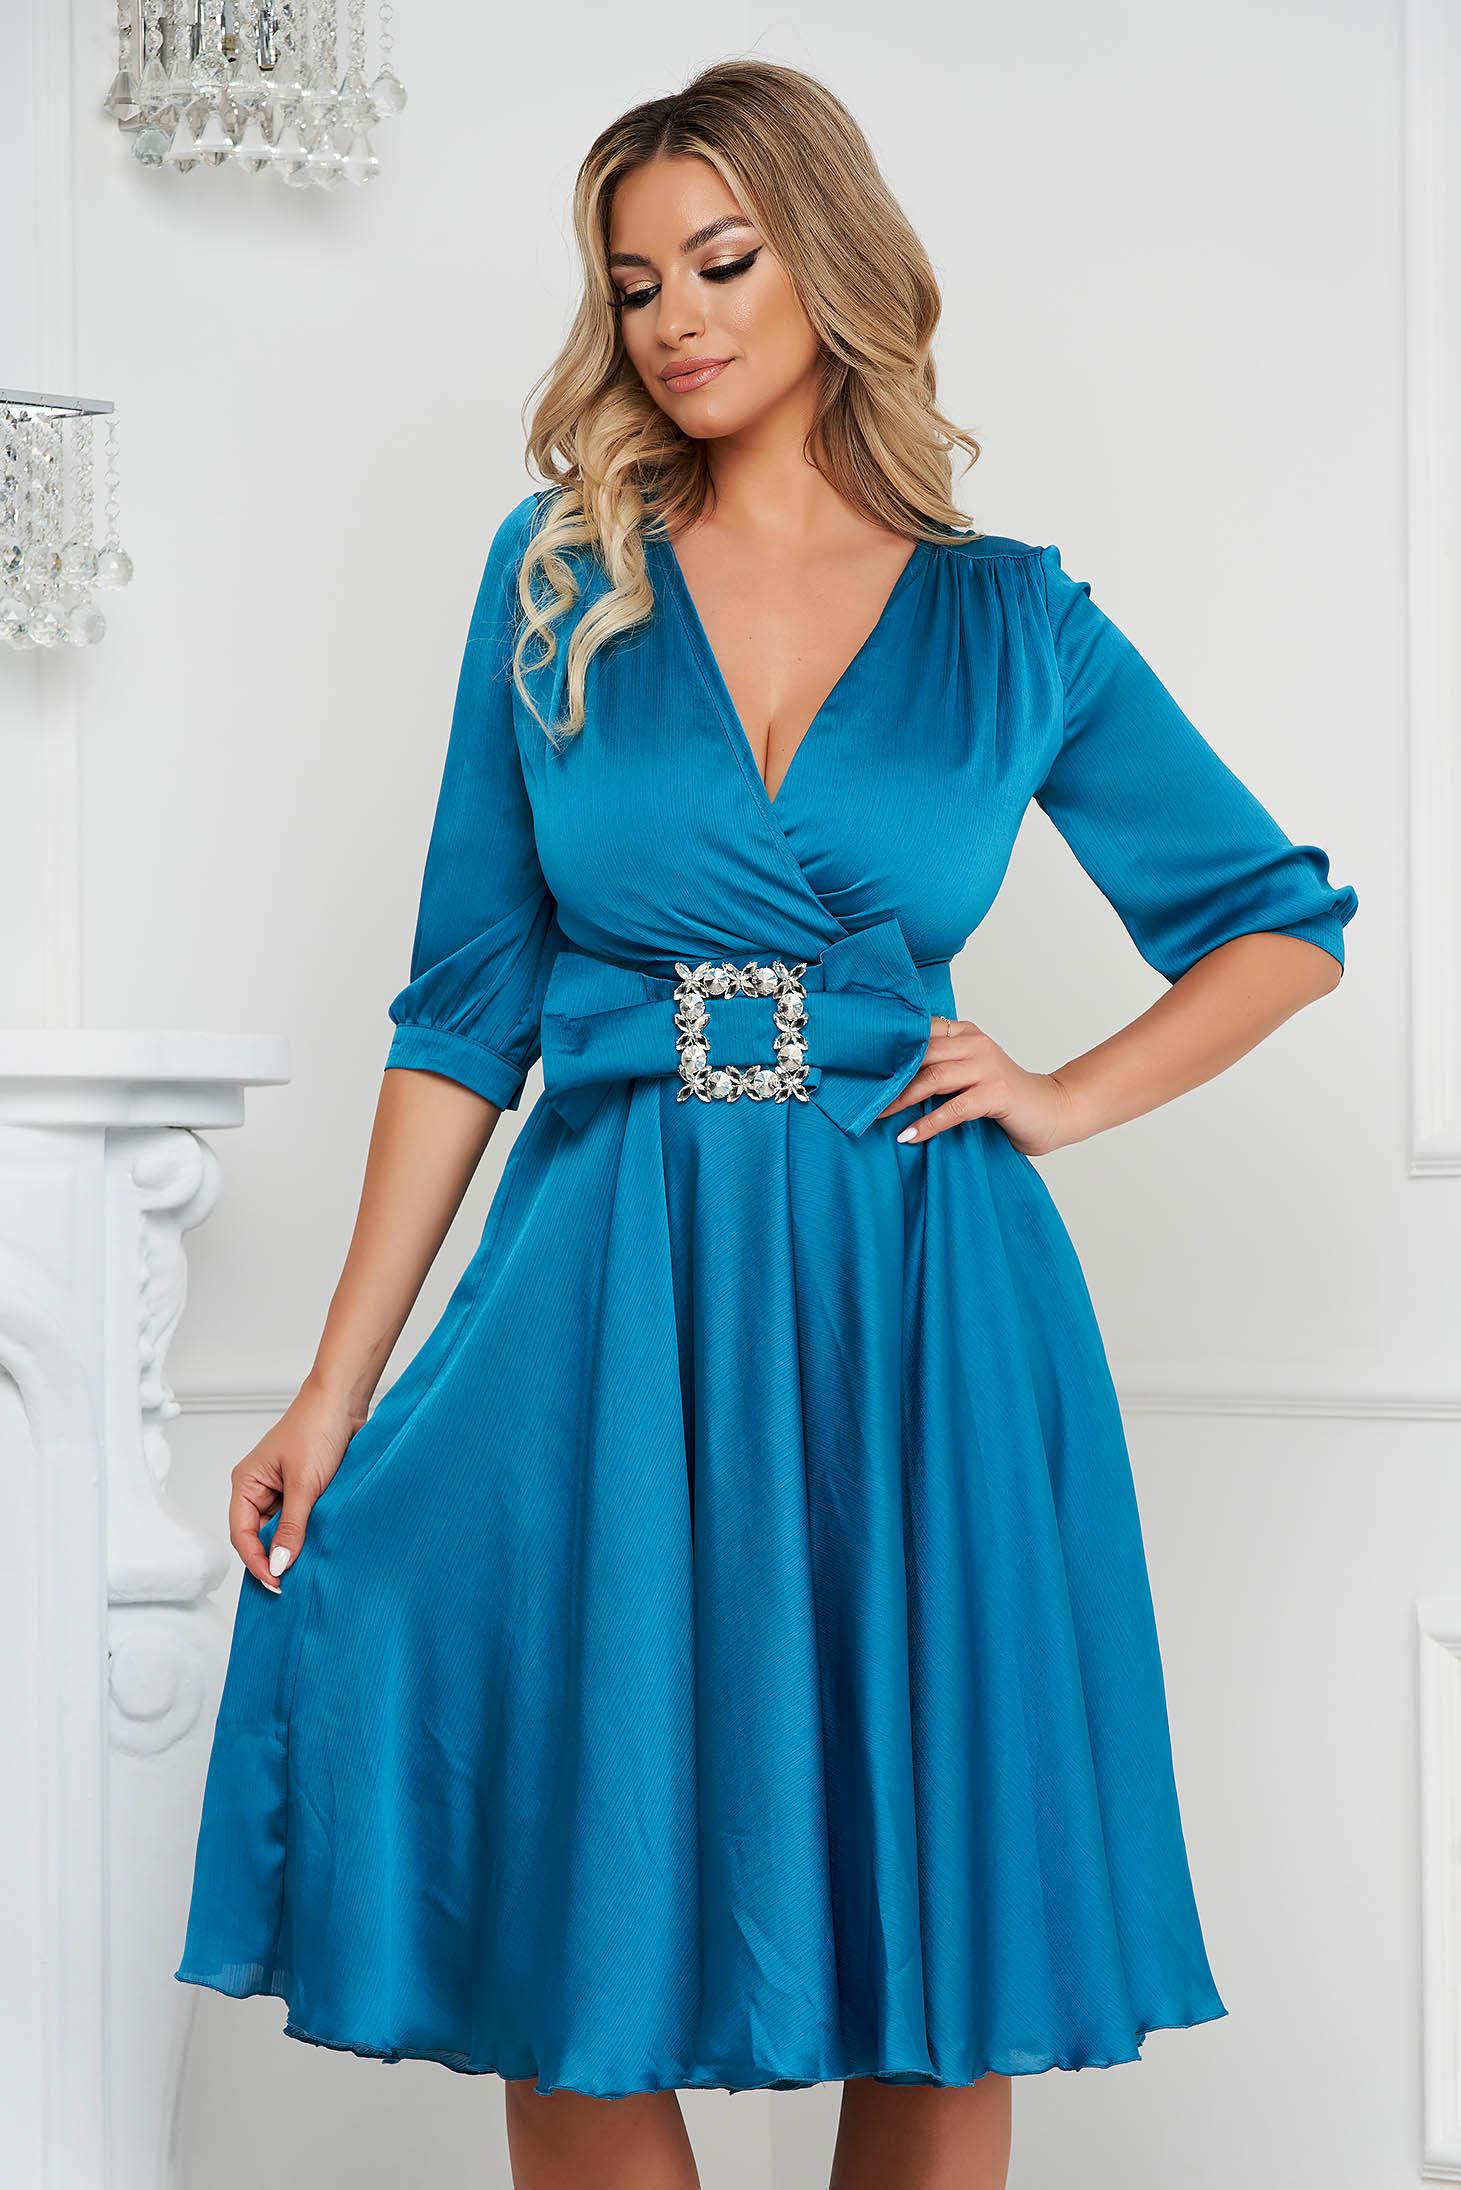 Rochie PrettyGirl turcoaz eleganta midi in clos din satin accesorizata cu o catarama